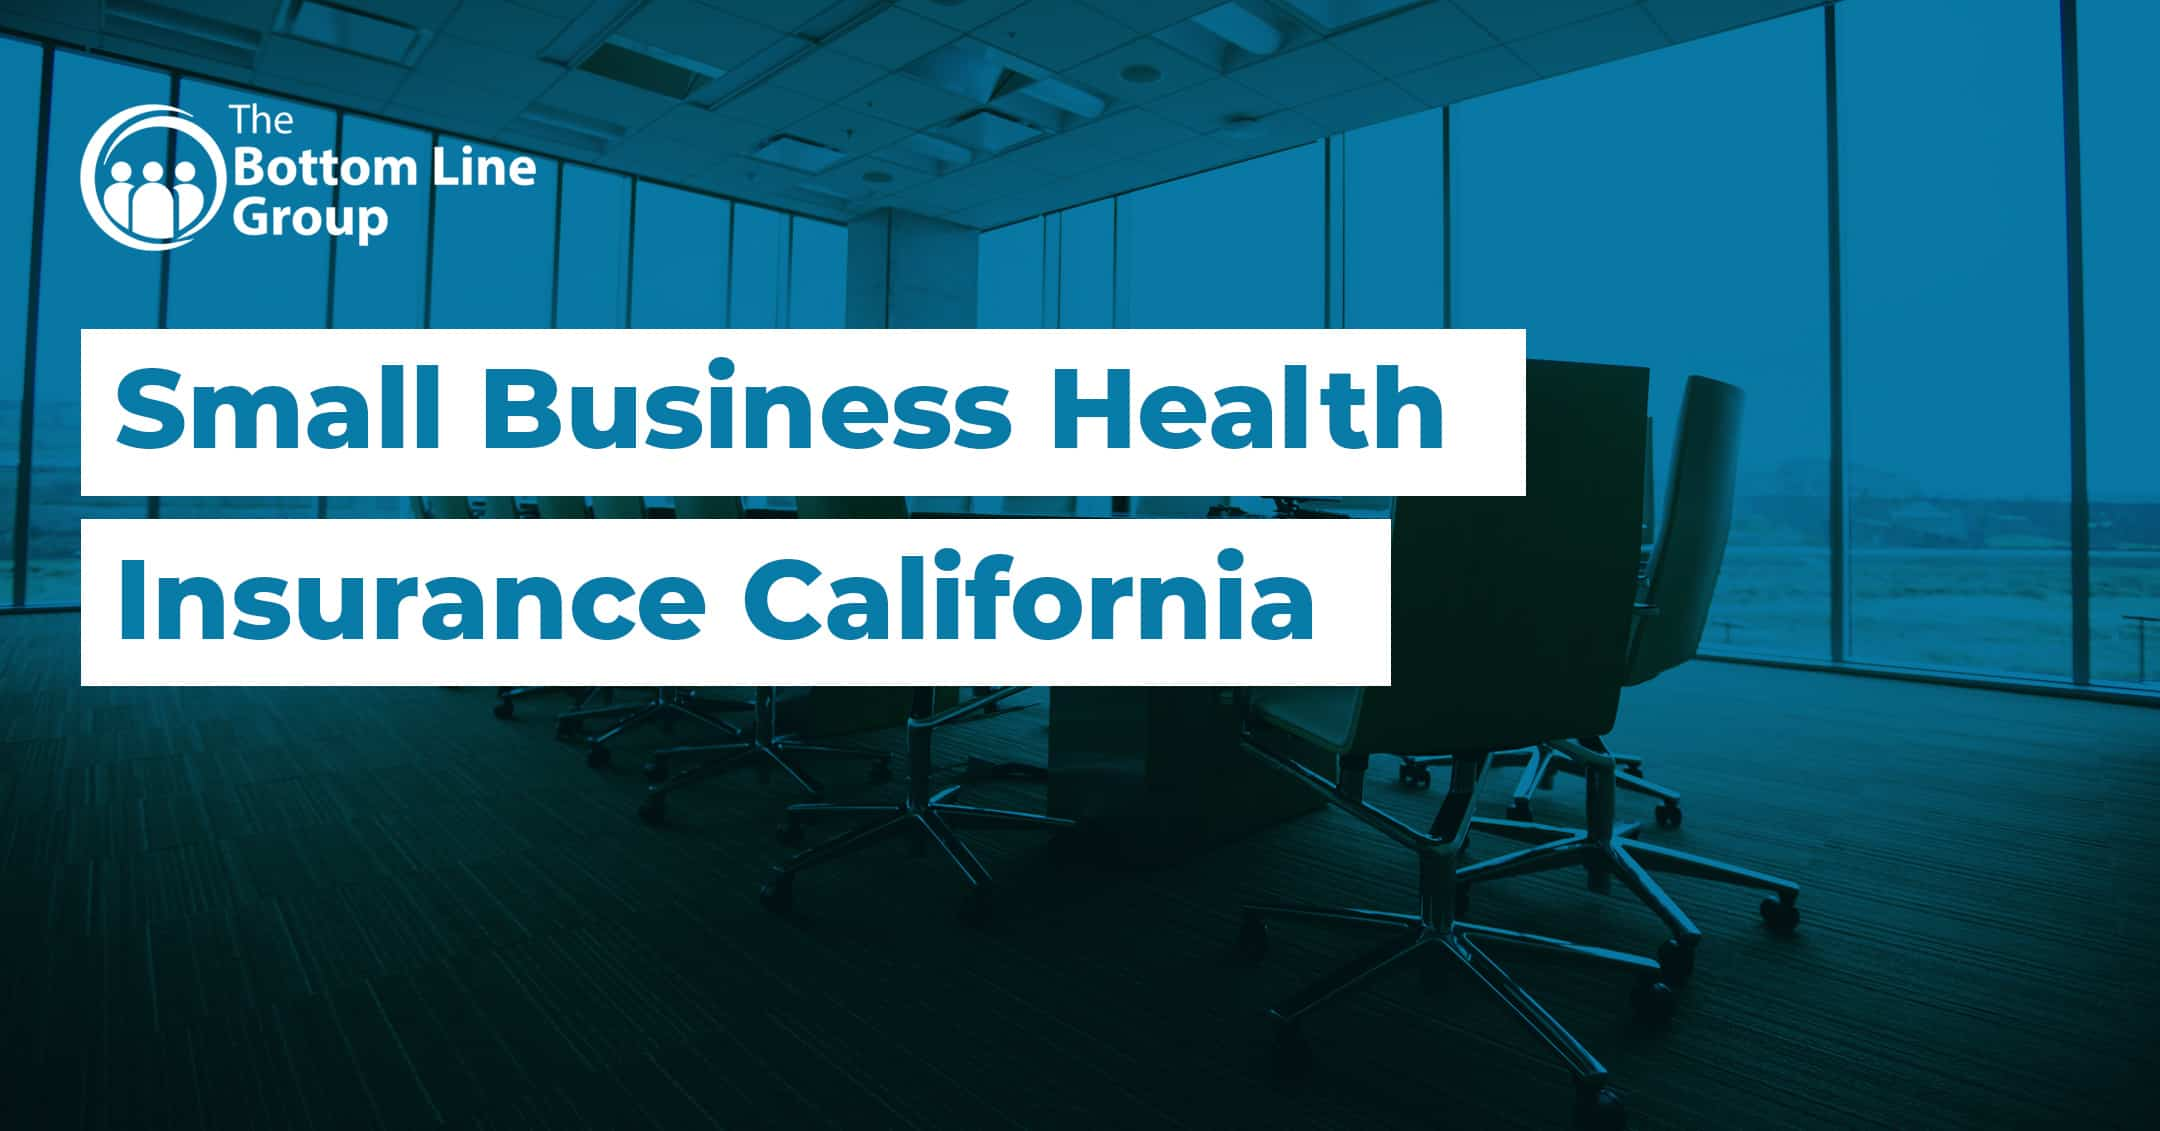 50-(Small-Business-Health-Insurance-California)1